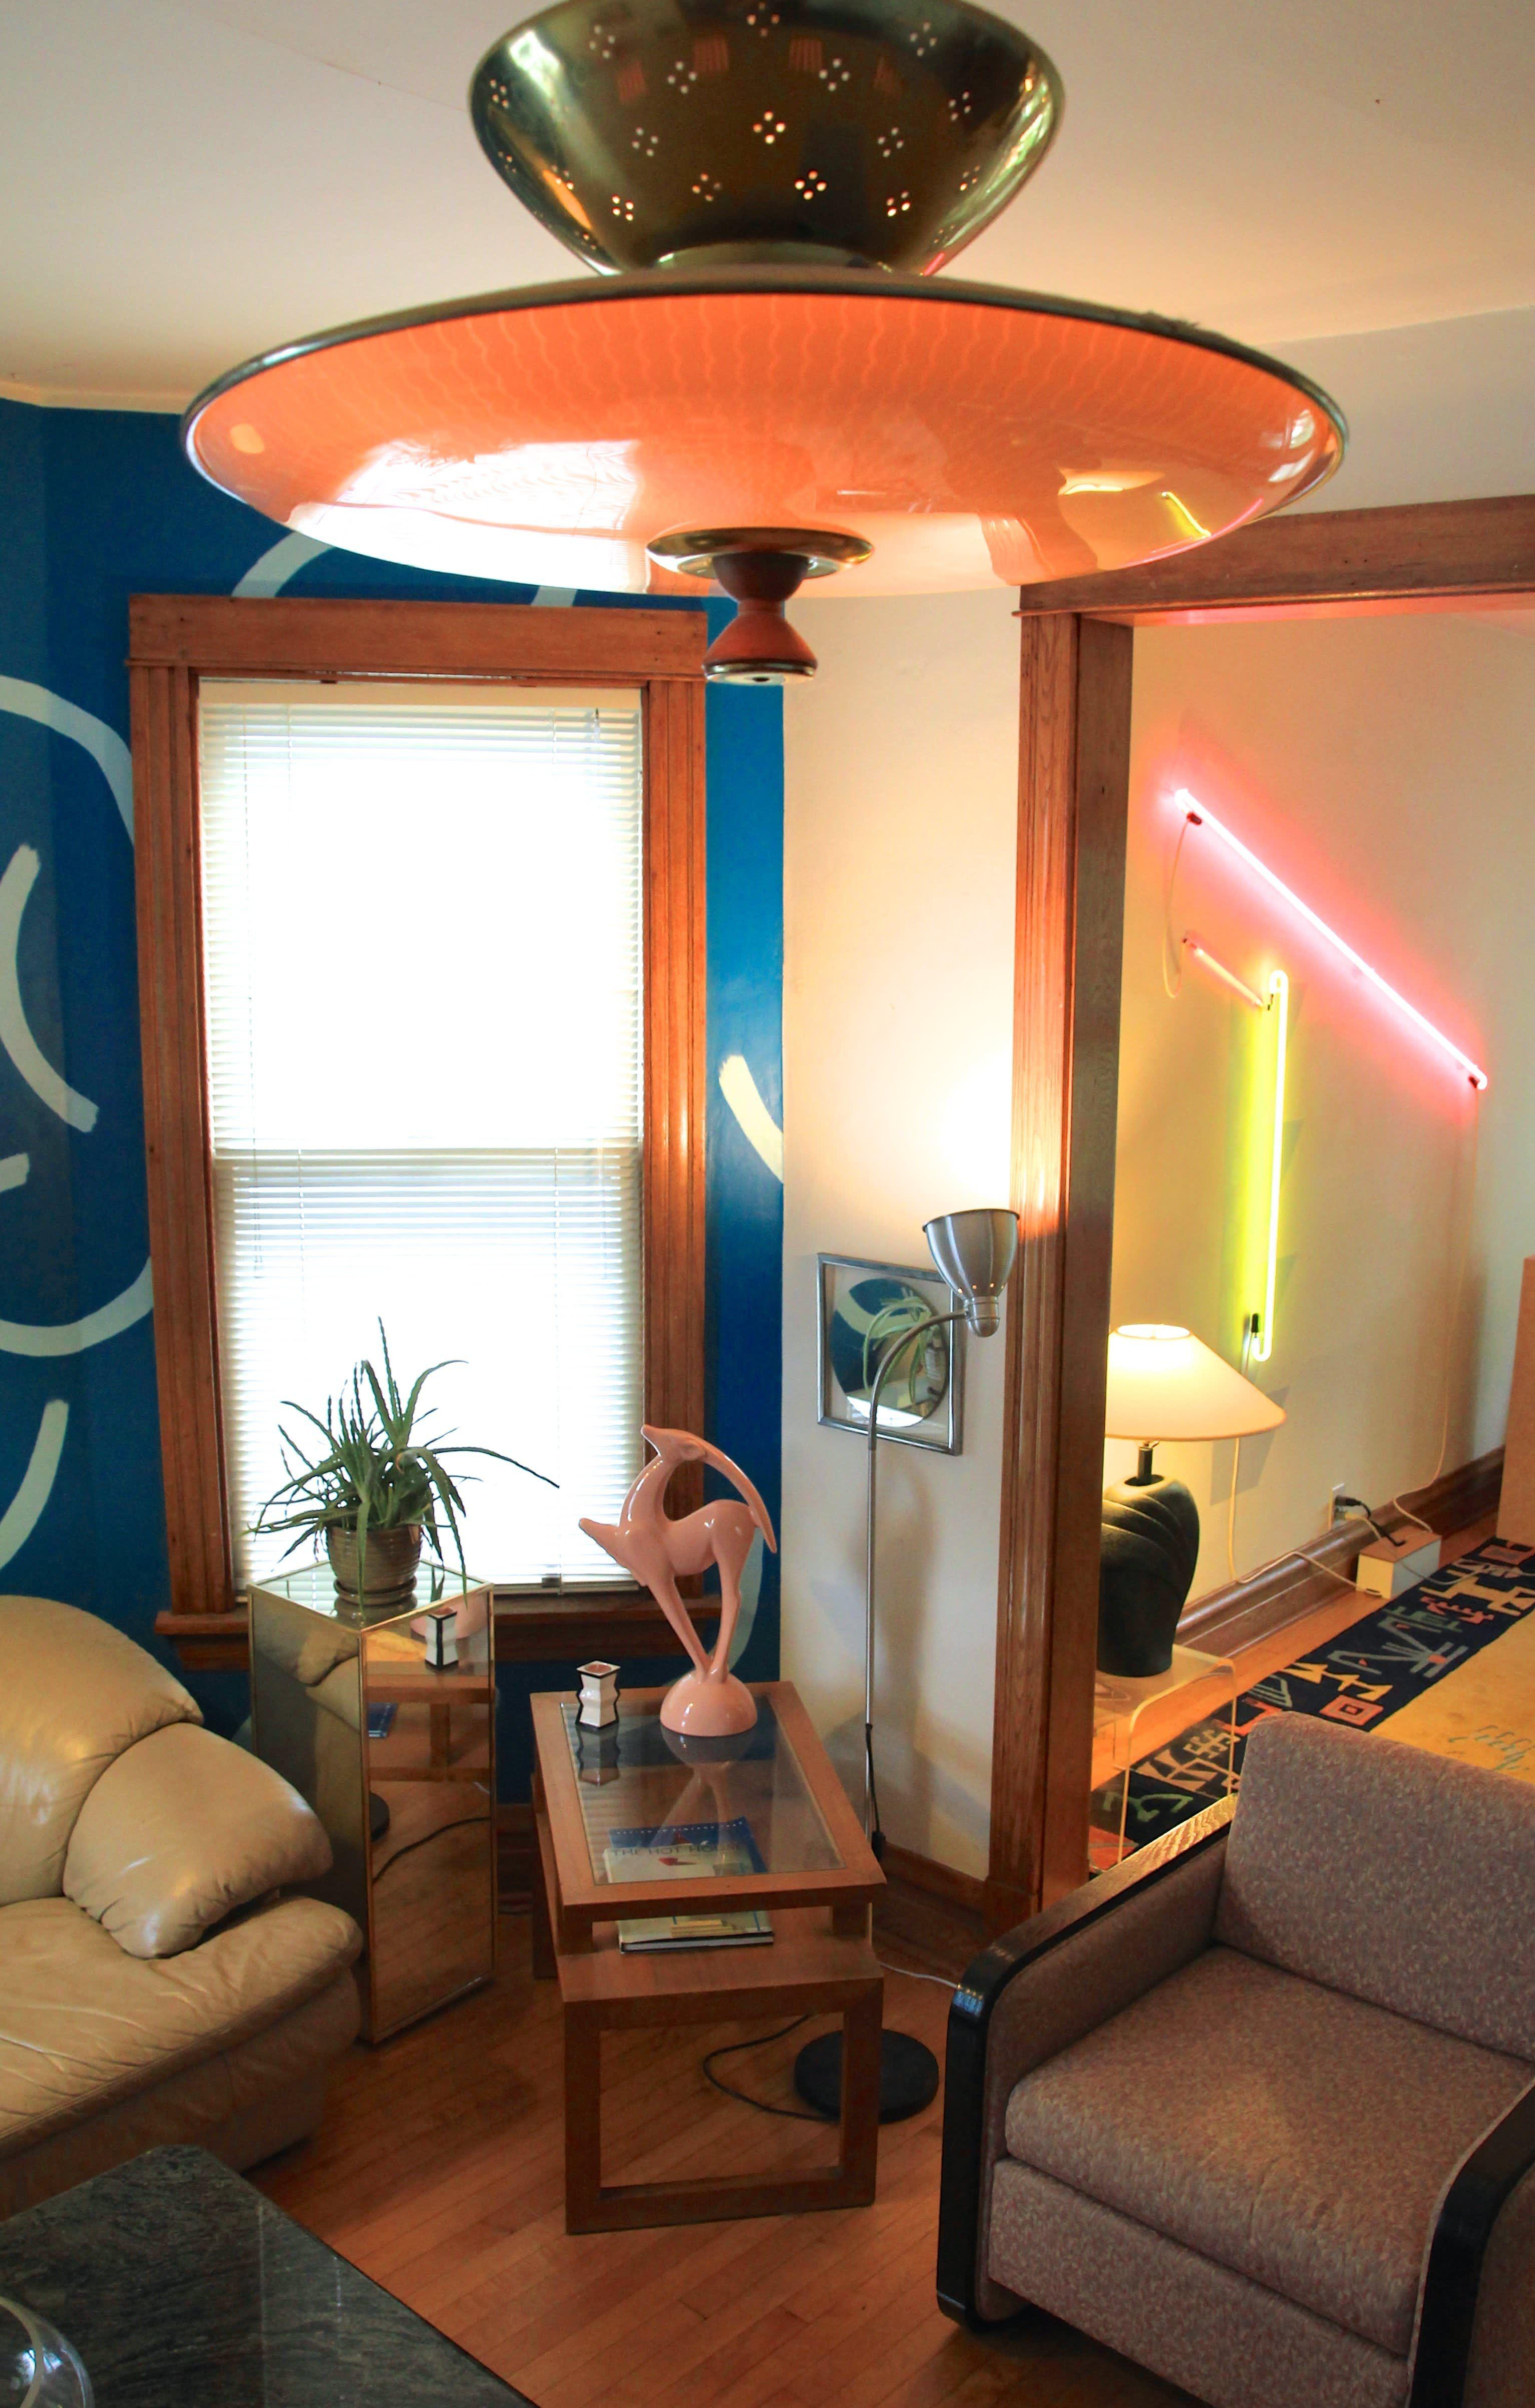 Meg's MemphisInspired '80s Apartment 80s interior